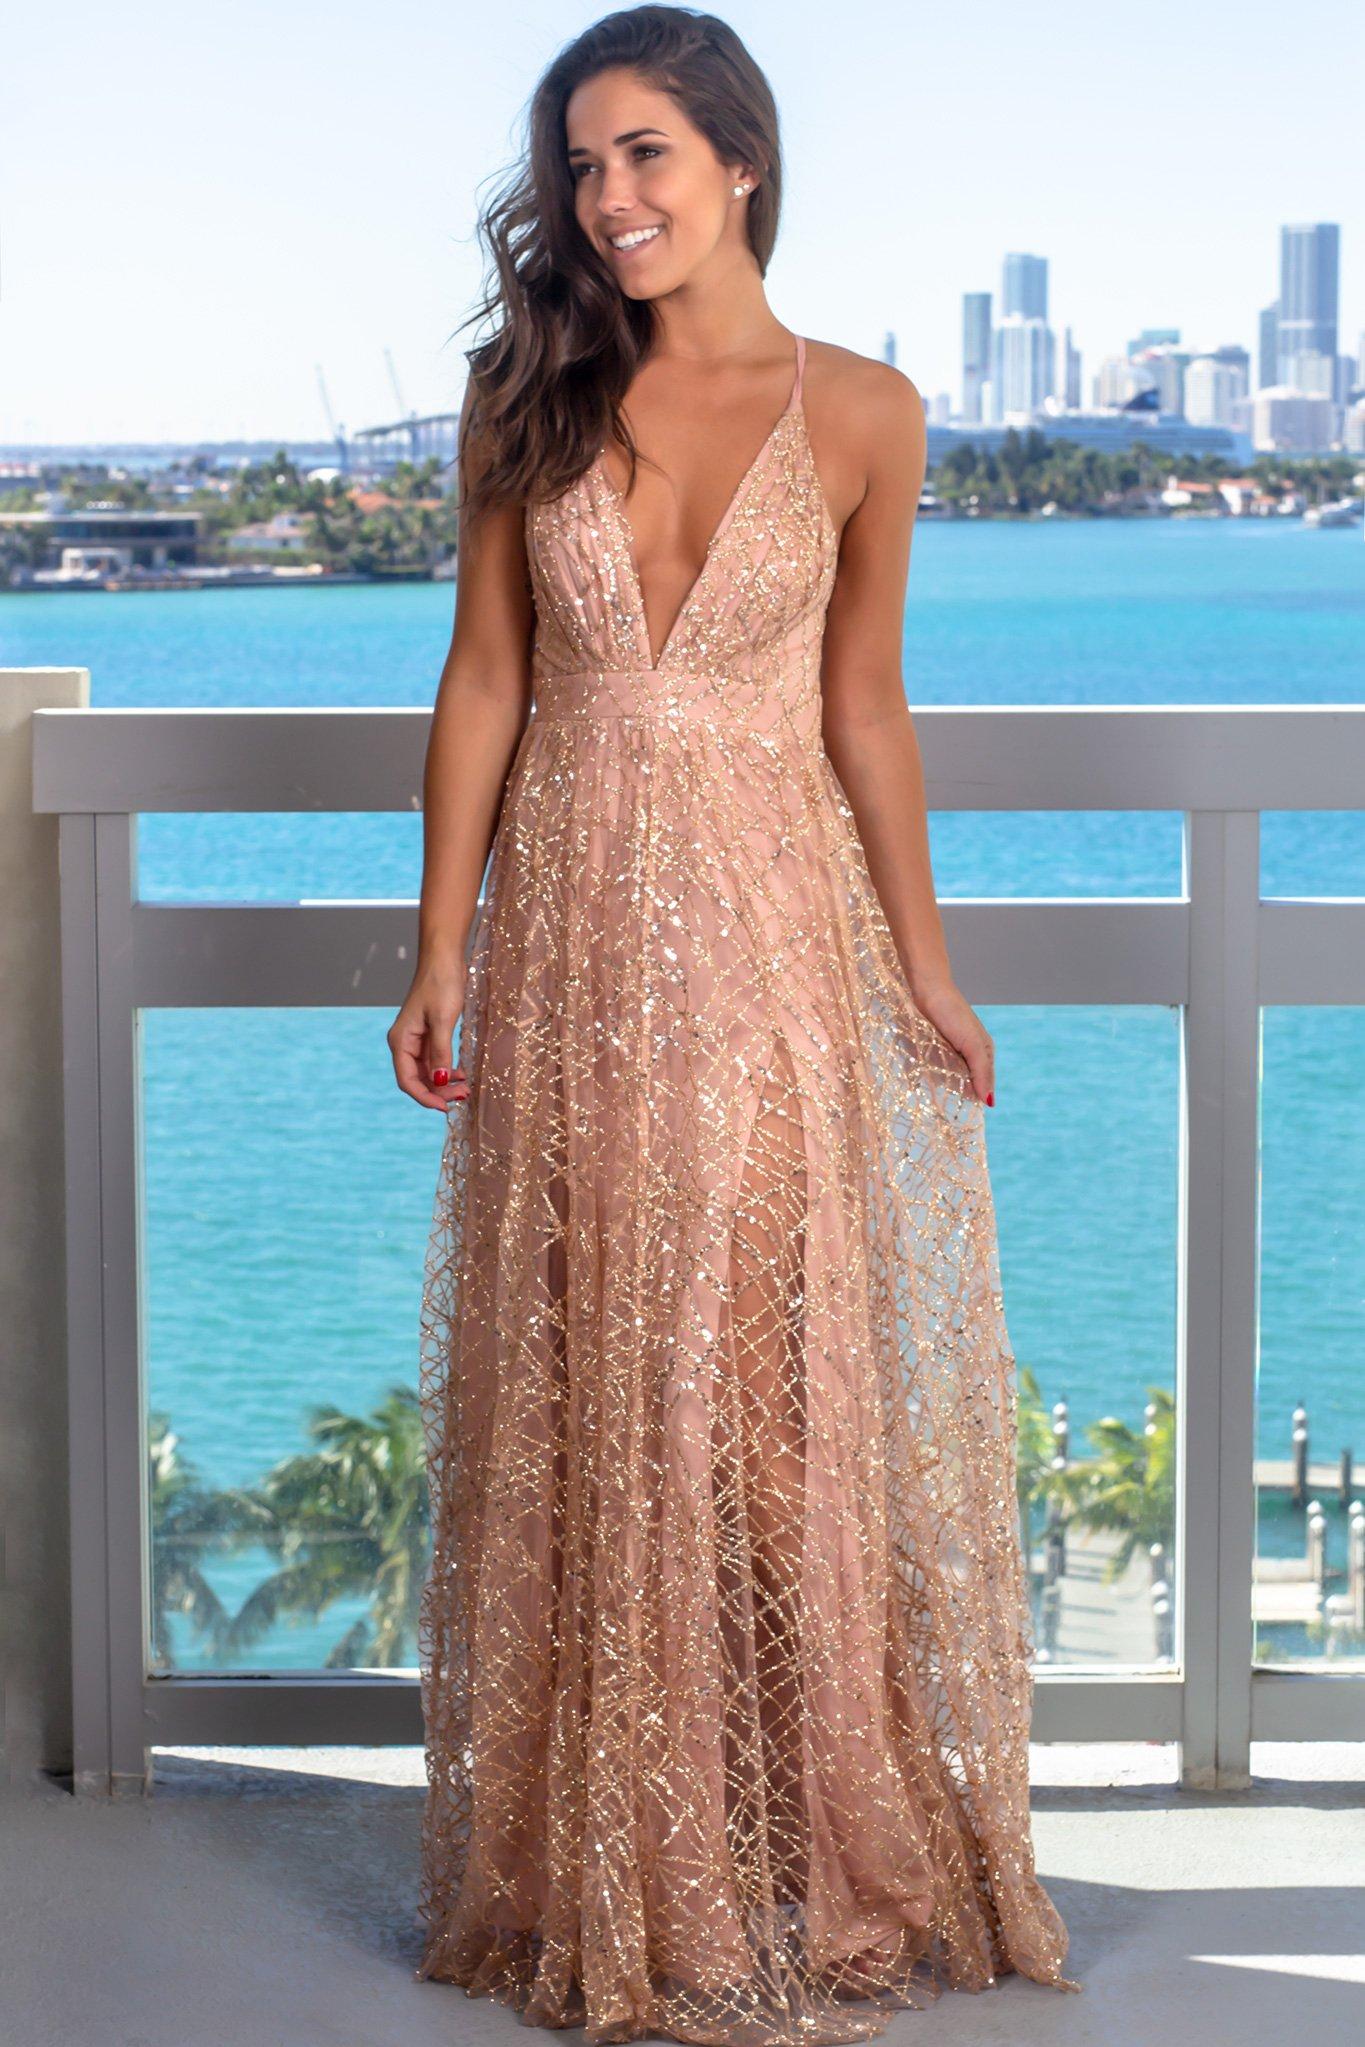 Rose Gold Maxi Dress With Sequins Gold Maxi Dress Dresses Printed Maxi Dress [ 2047 x 1365 Pixel ]